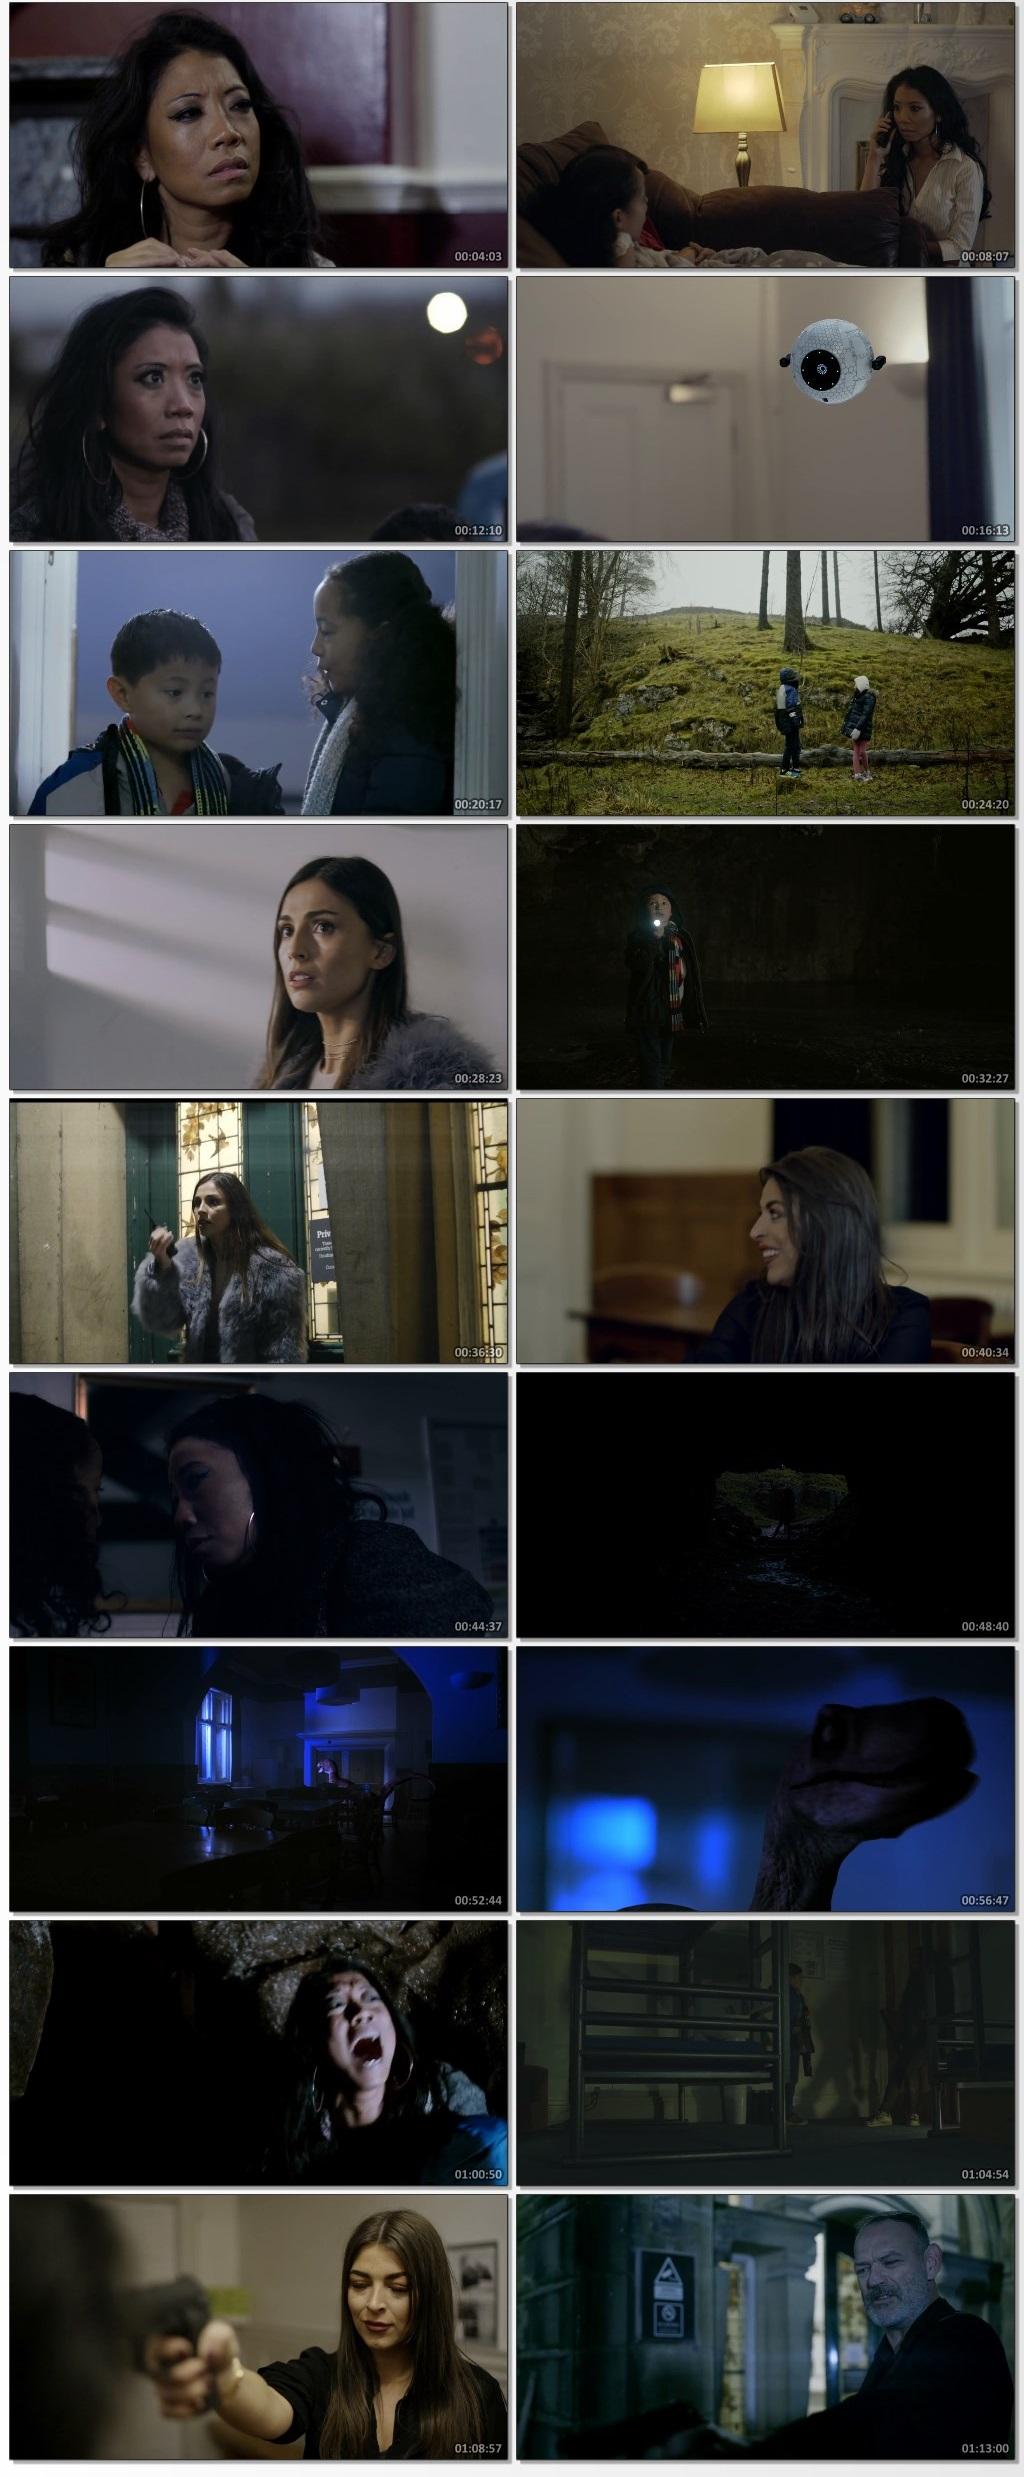 www-7-Star-HD-Page-Dinosaur-Hotel-2021-English-720p-AMZN-WEB-DL-Encoded-mkv-thumbs